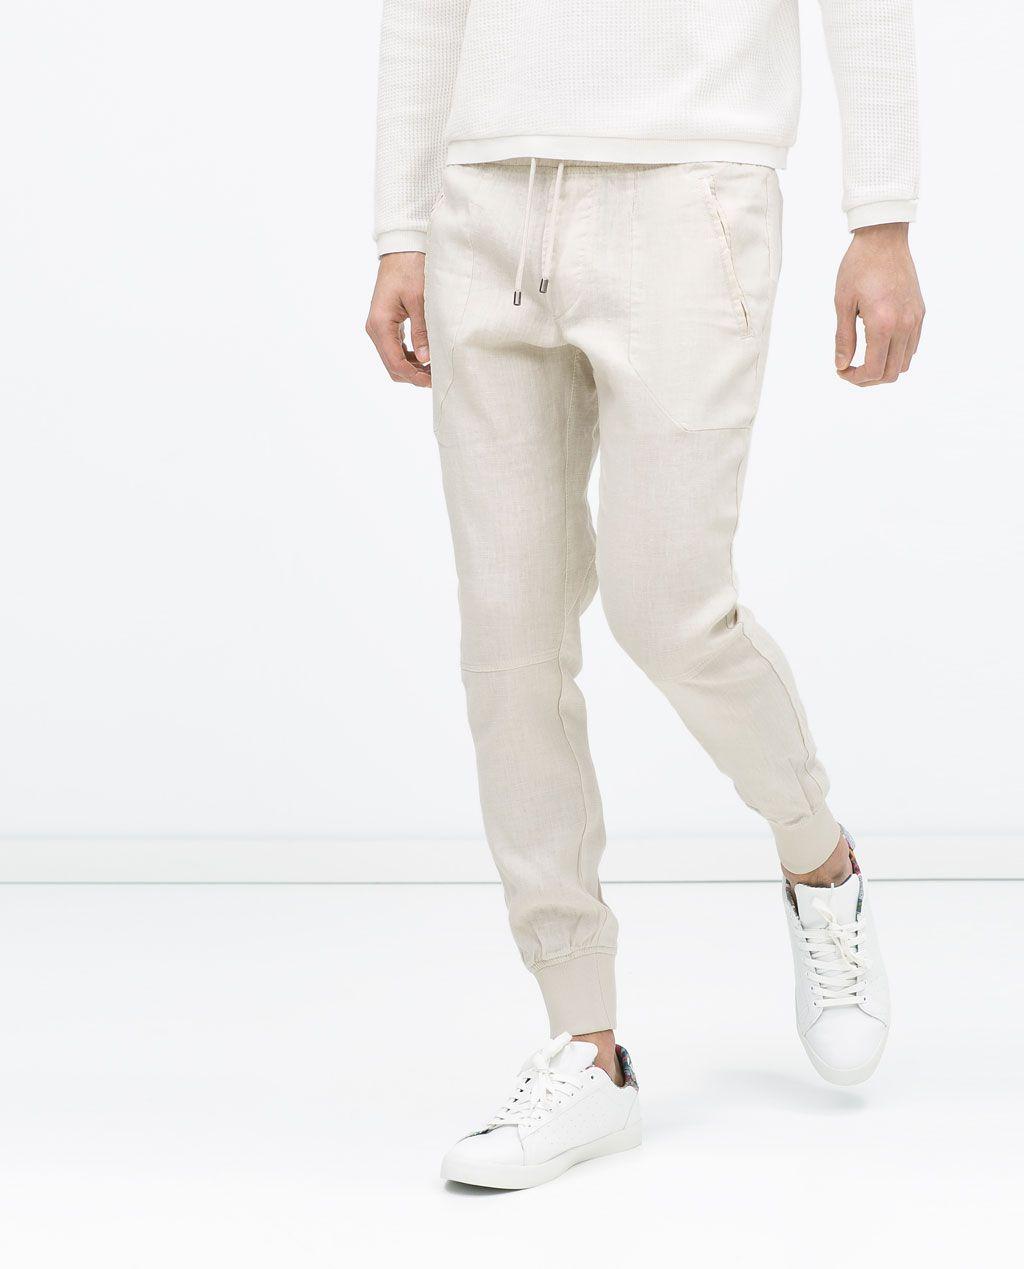 df1151ce4a5b30 ZARA - SALE - LINEN JOGGING PANTS | BOTTOM | Pants, Mens joggers ...